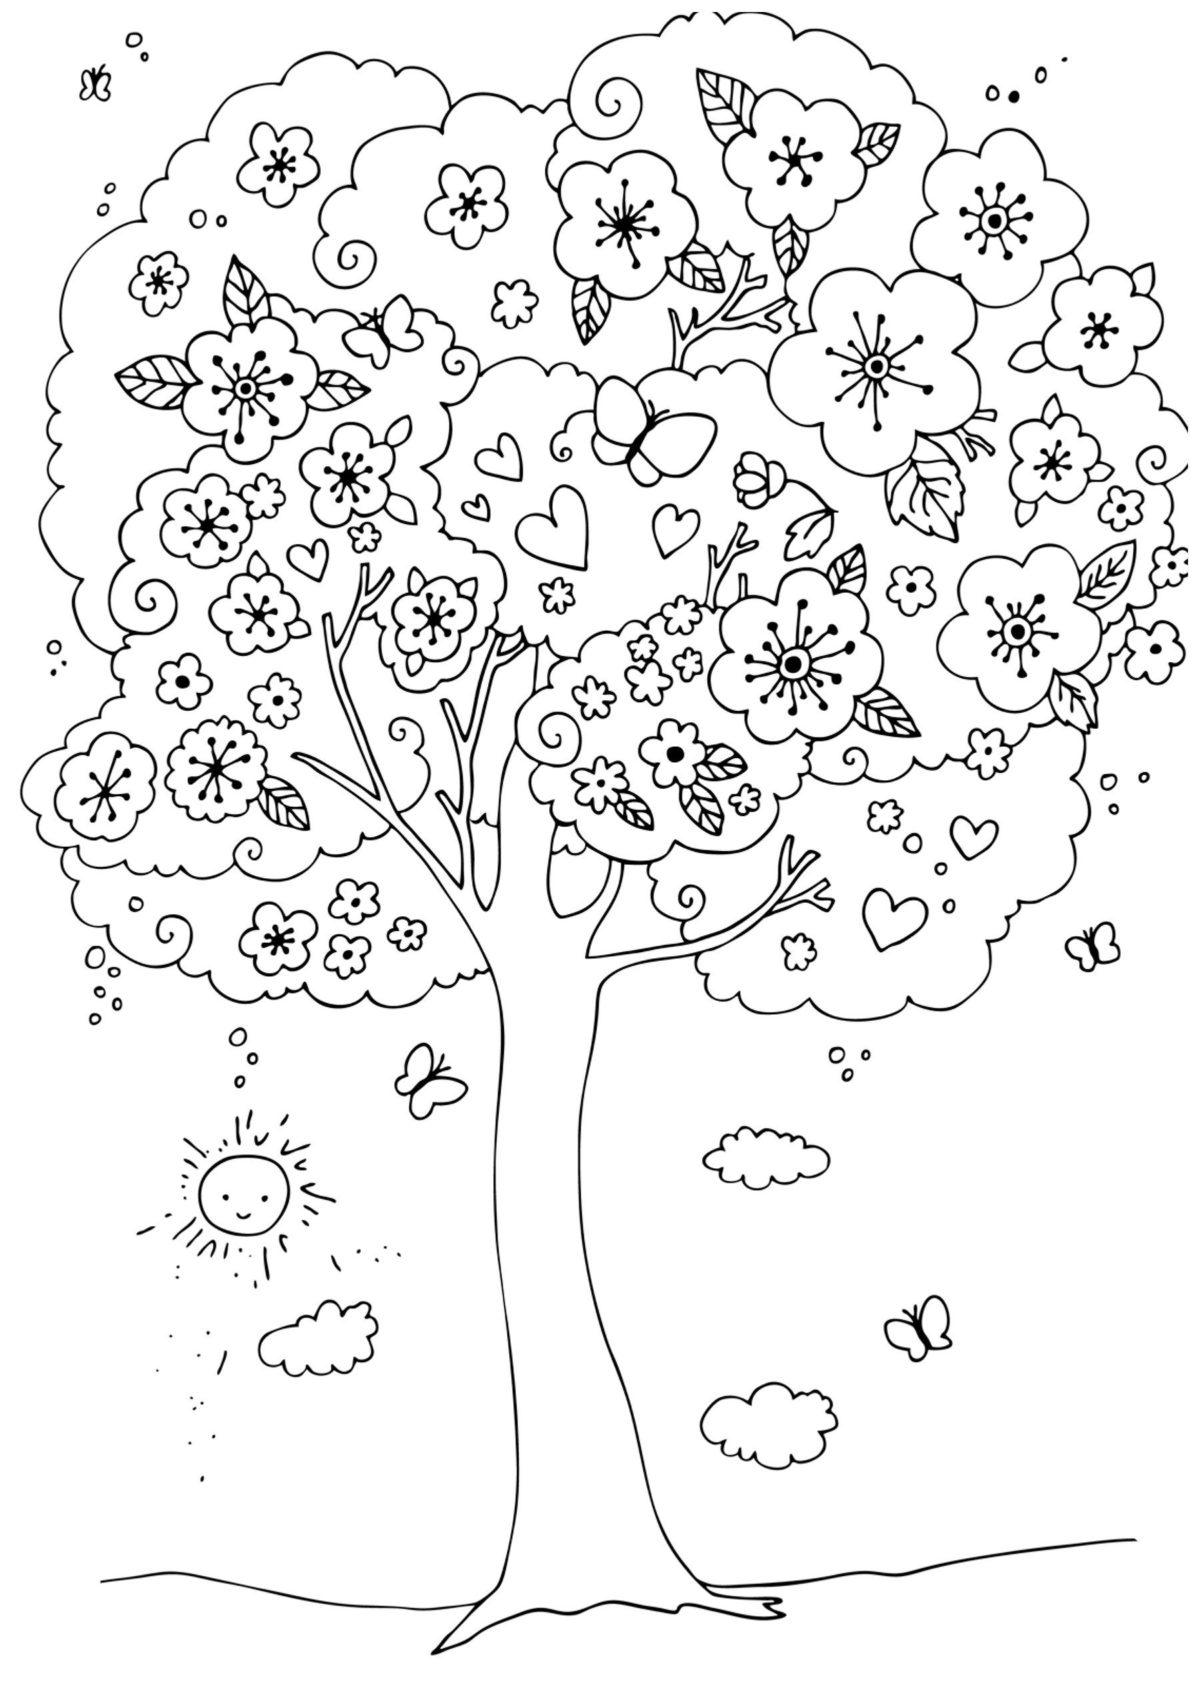 Цветущая вишня - Картинка для раскрашивания красками-гуашью